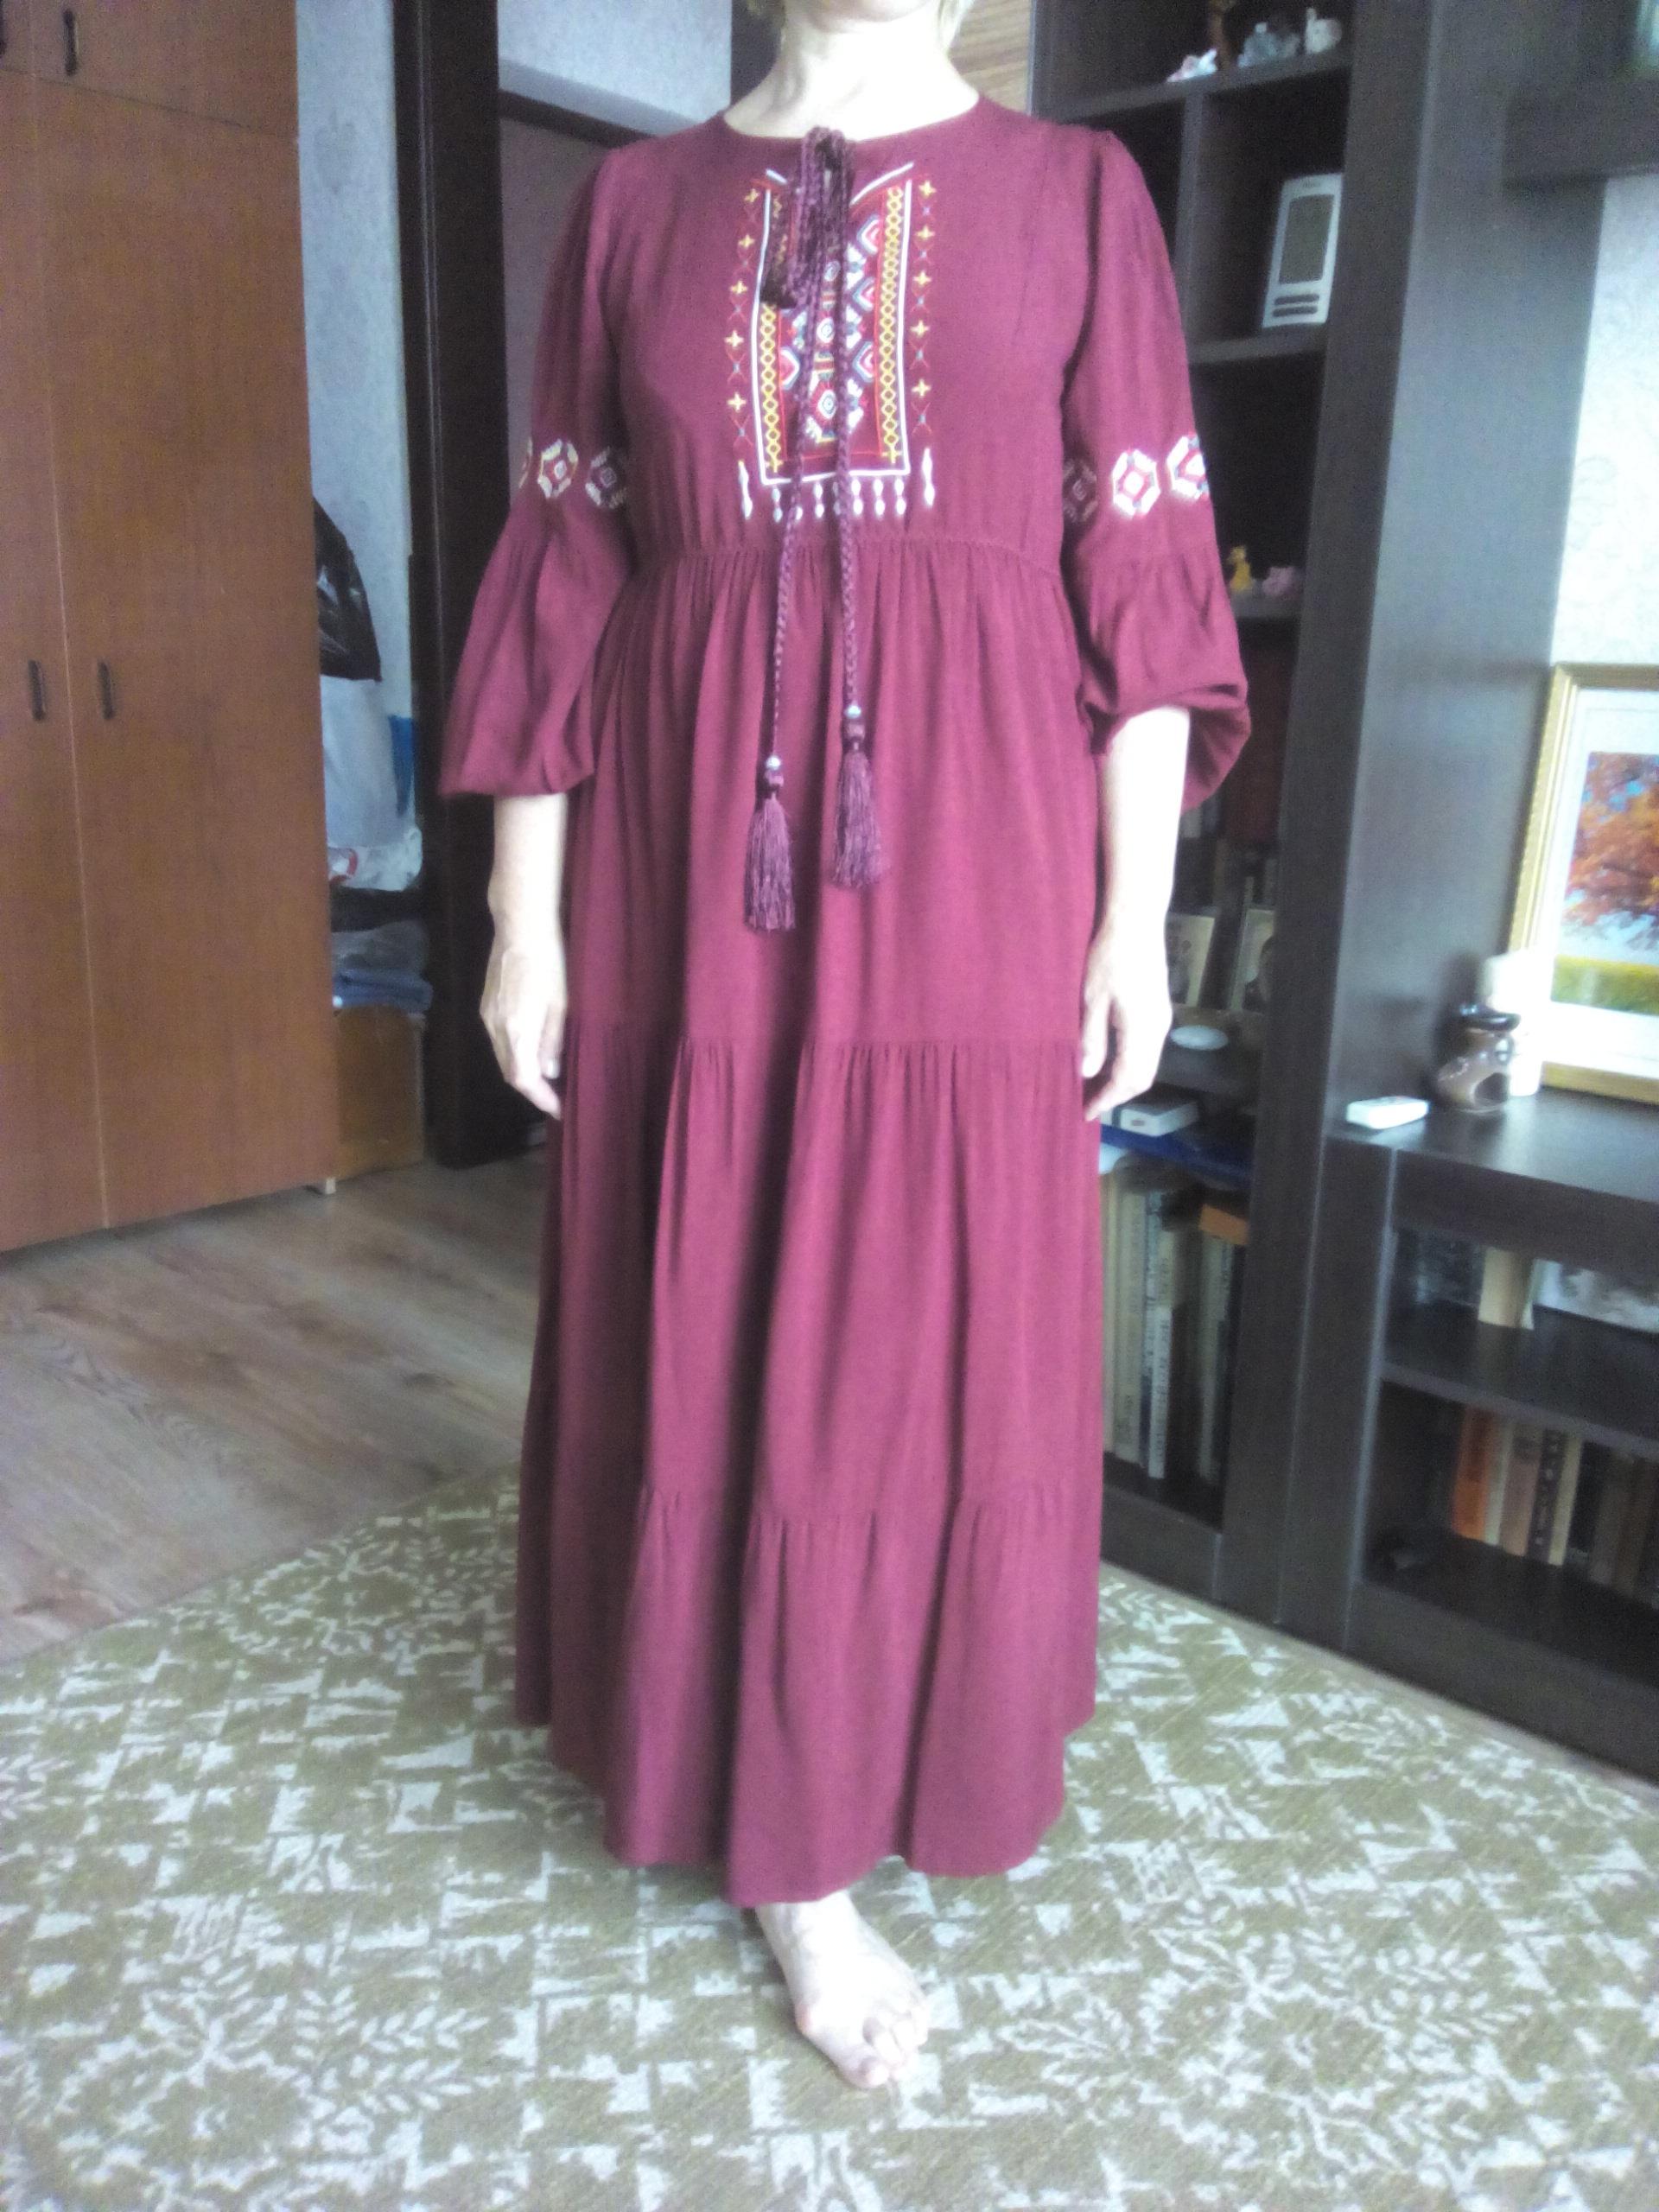 Ethnic Geometric Embroidery Long Dress Autumn Women'S Casual Maxi Dresses Long Sleeve Draped Swing Burgundy Fall photo review